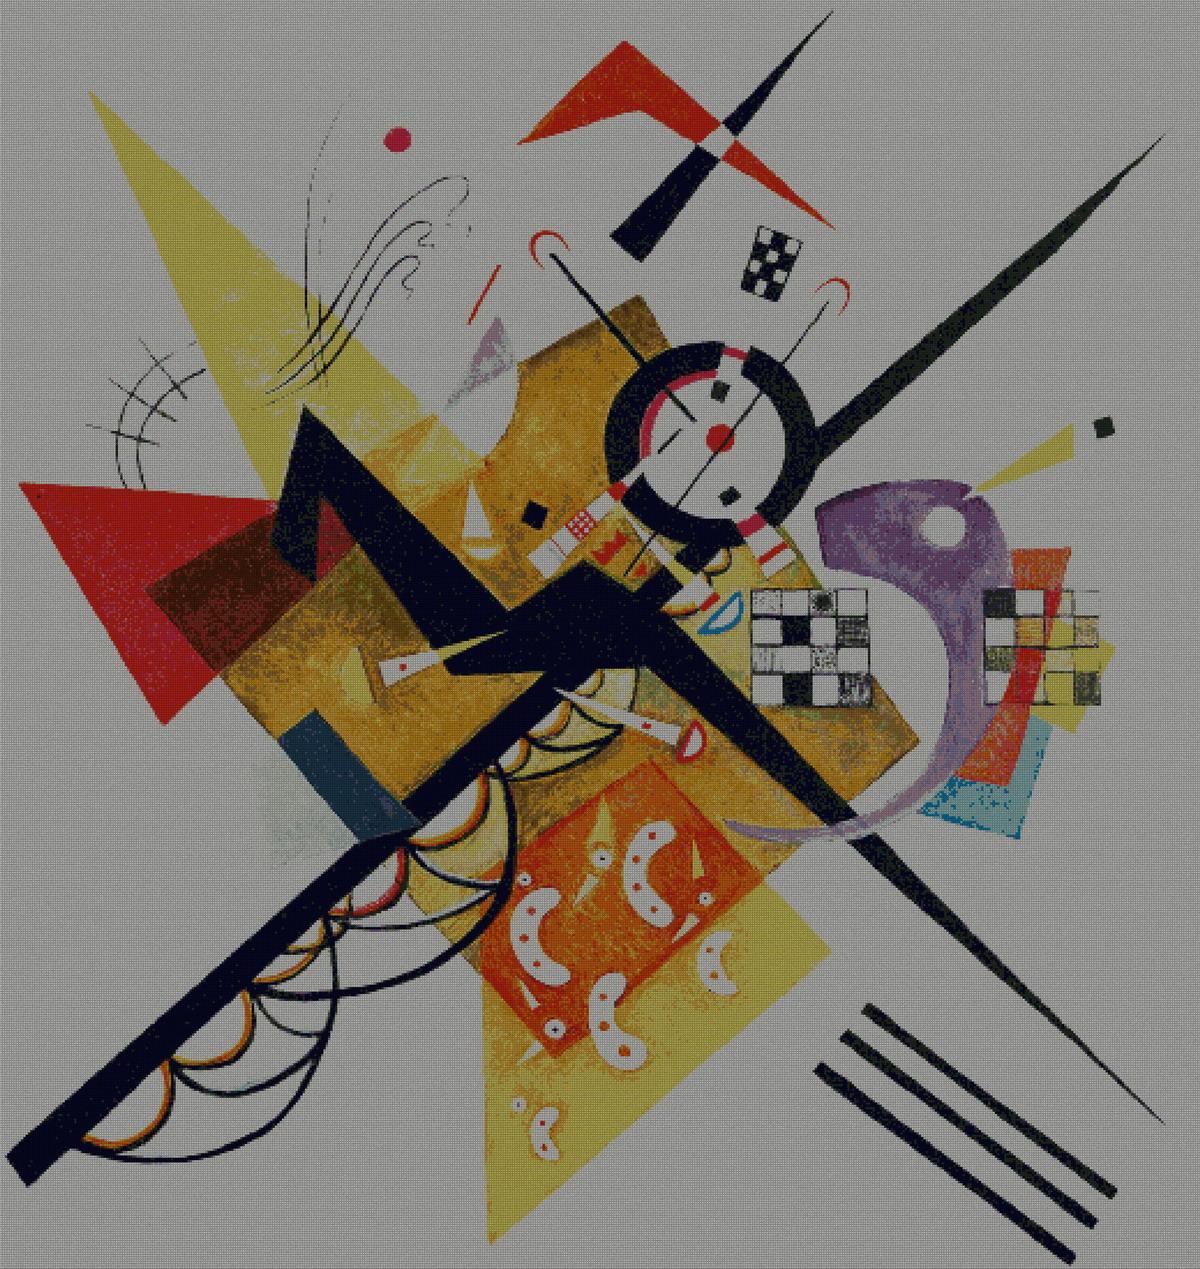 pittori_moderni/kandinsky/Kandinsky_-_Auf_Weiss_520x550.jpg